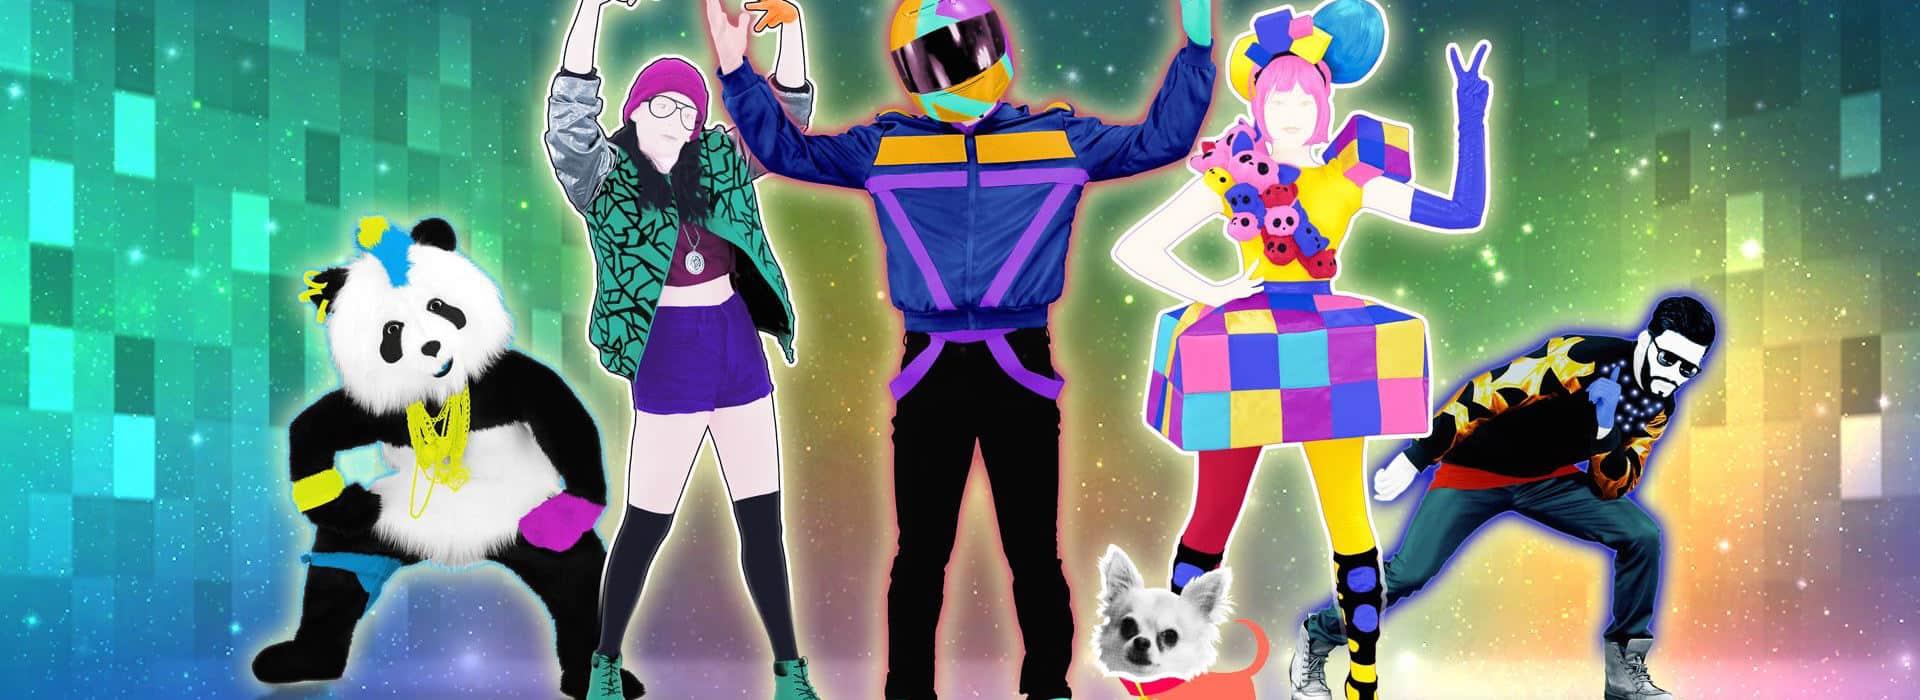 just-dance-2016-banner